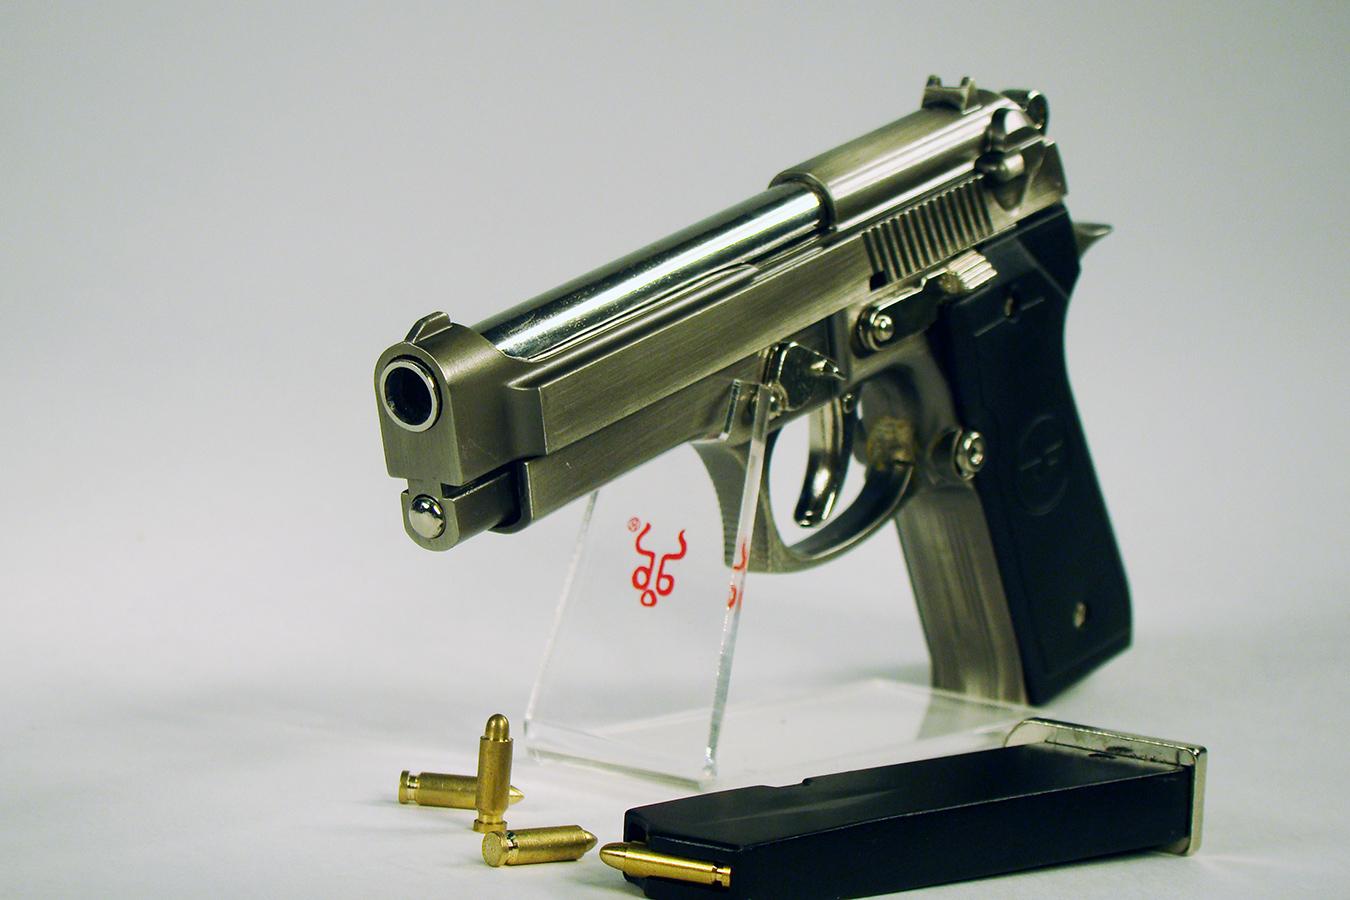 Beretta 92FS 15 см серая изображение 4